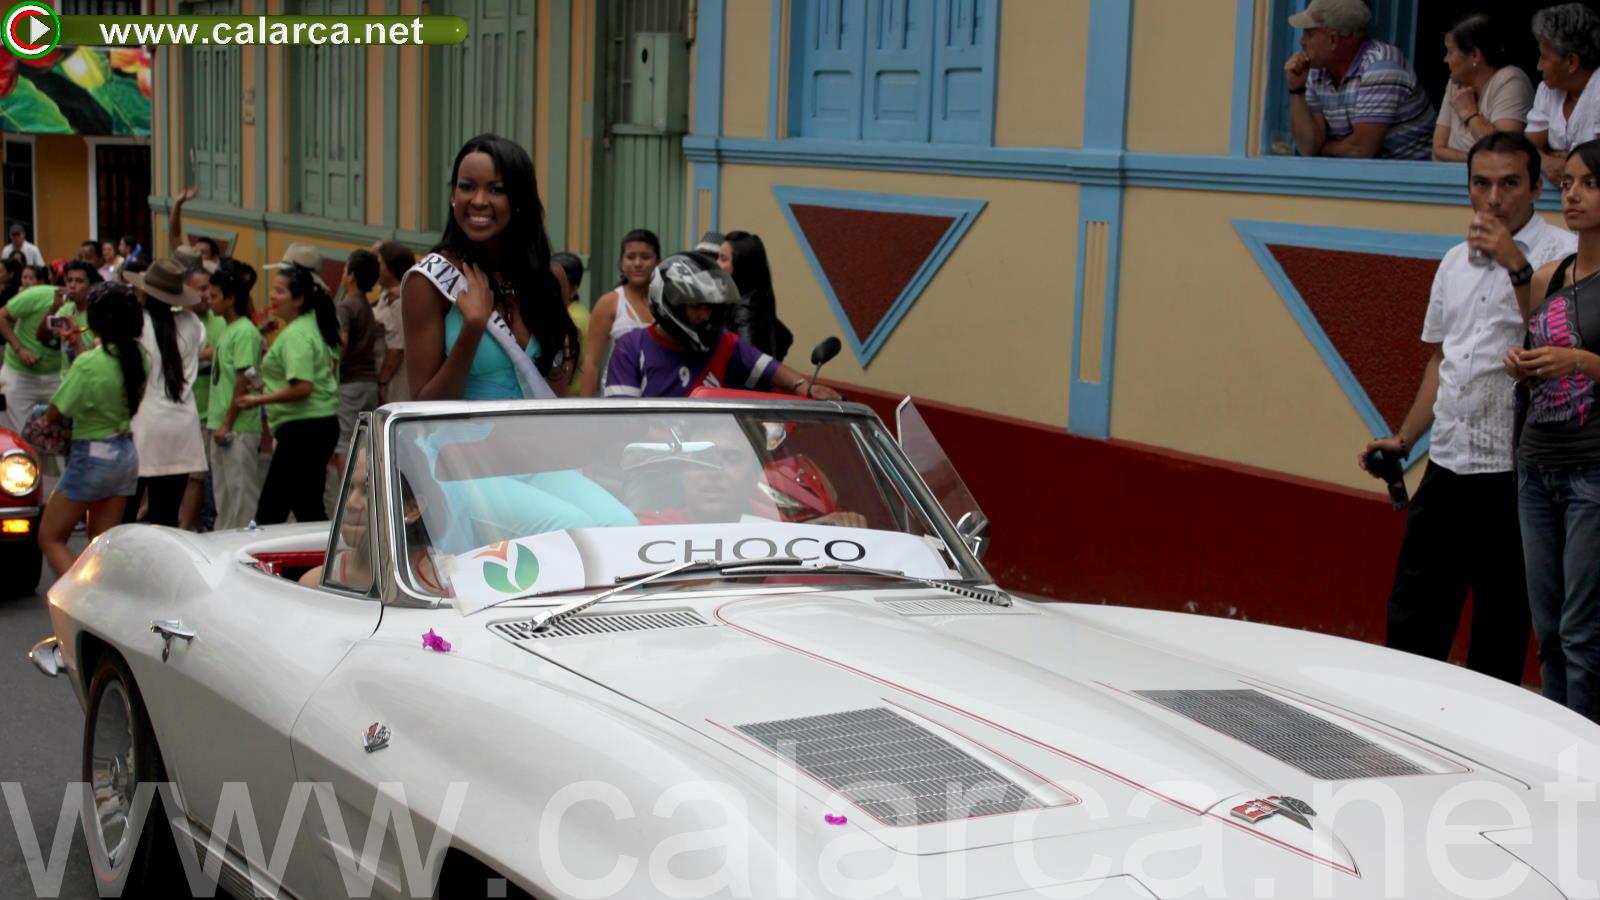 Chocó - Claudy Jessy Blandón Romaña